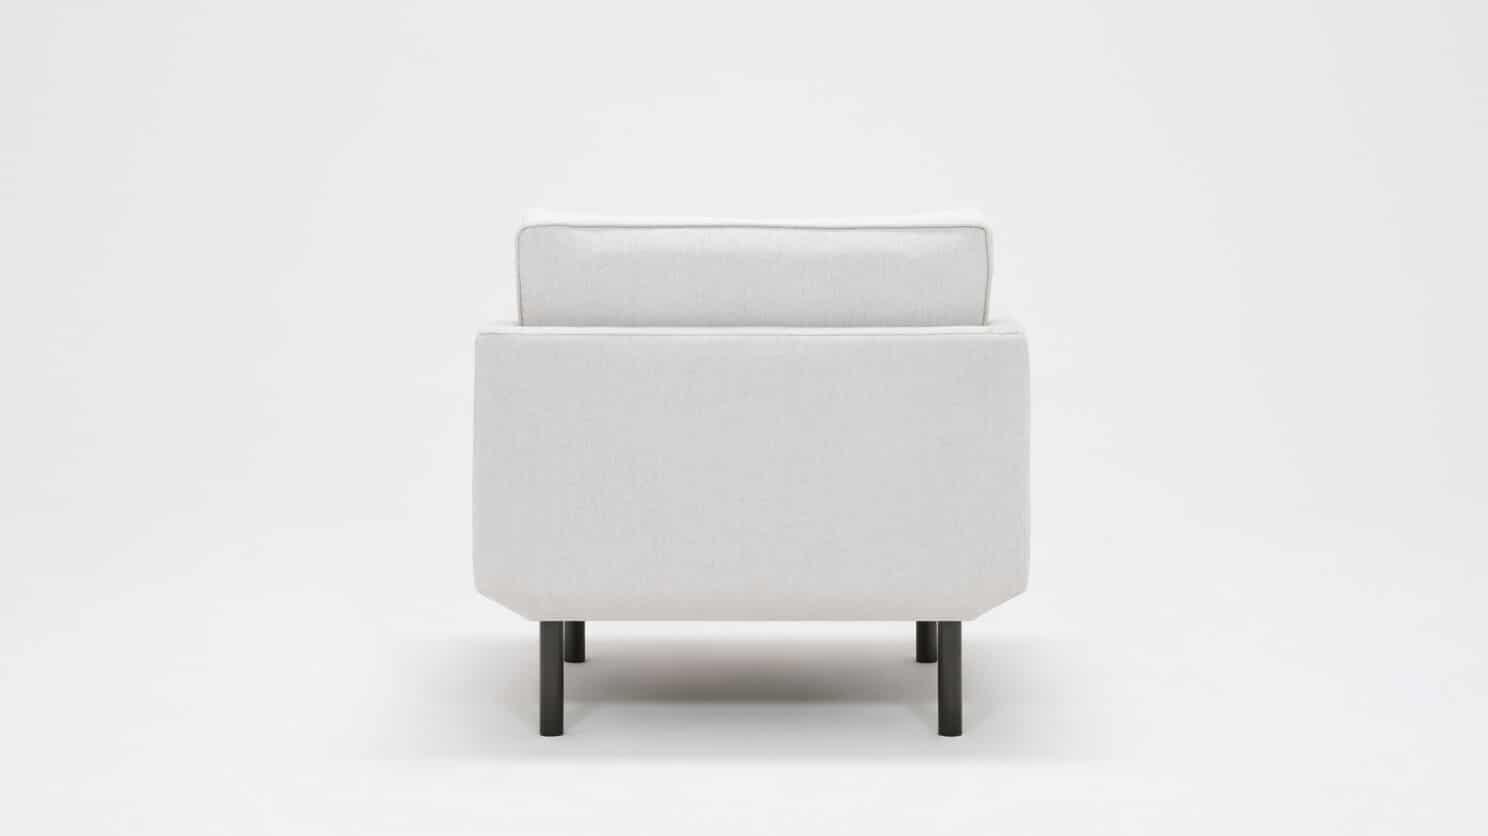 30154 95 5 chairs plateau club chair feather coda marble back 01